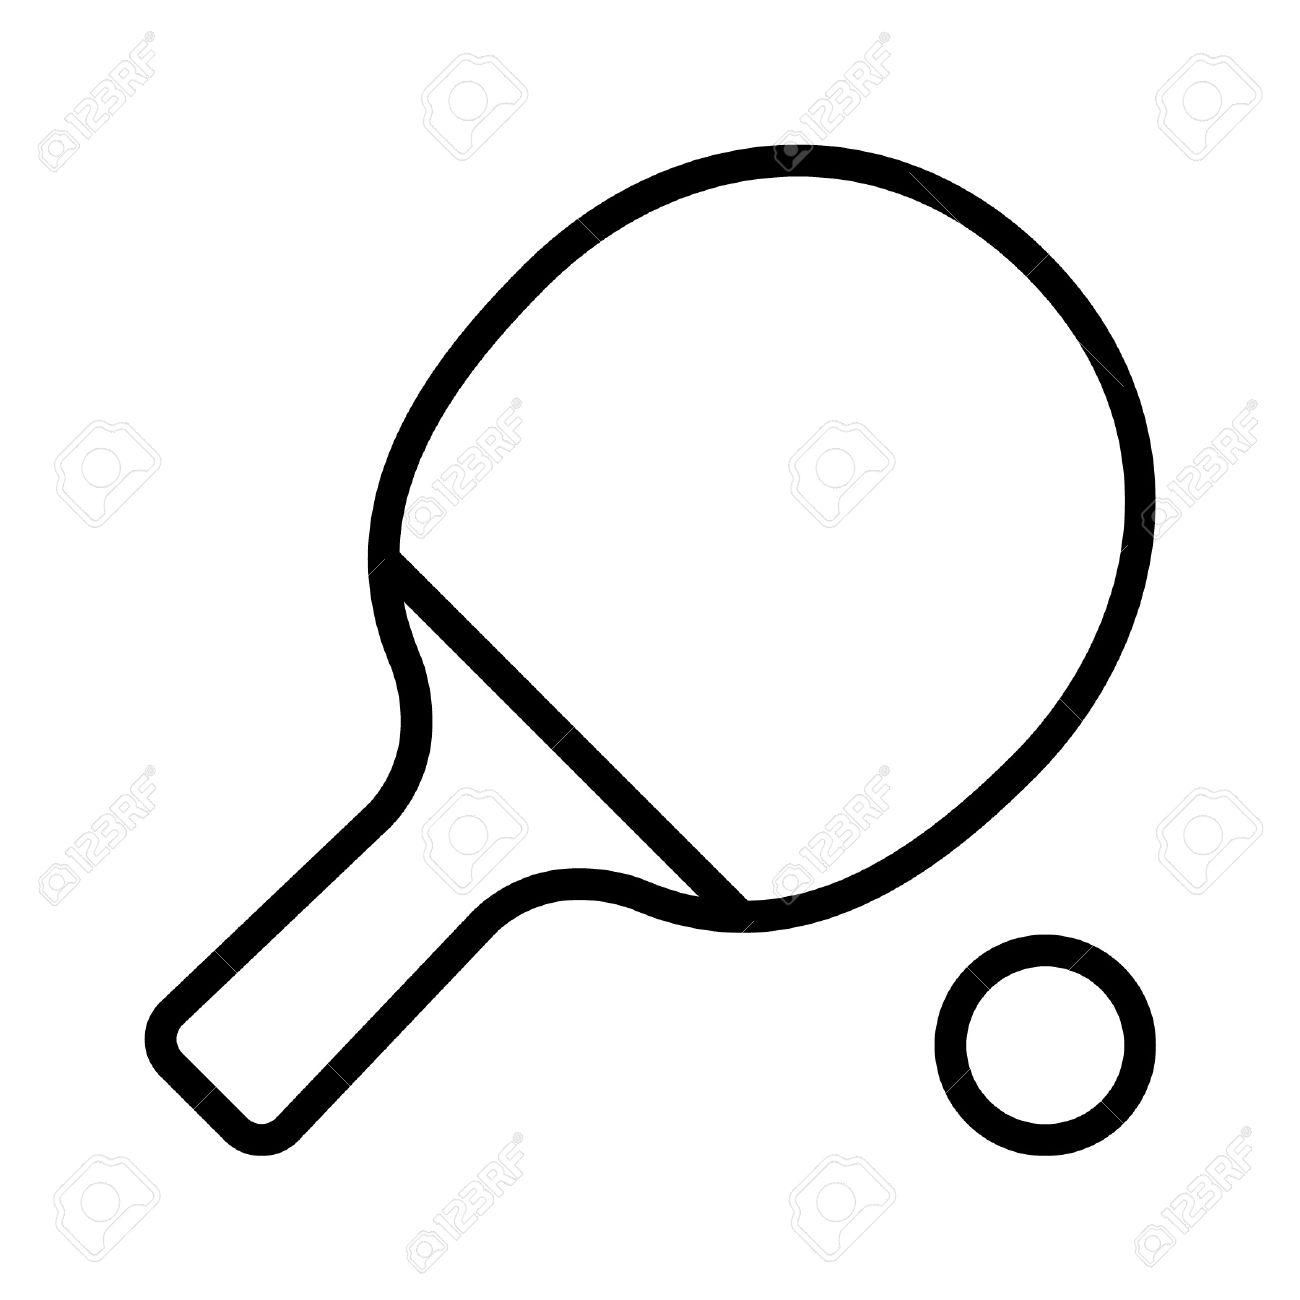 1300x1300 Tennis Ball Clipart Drawing